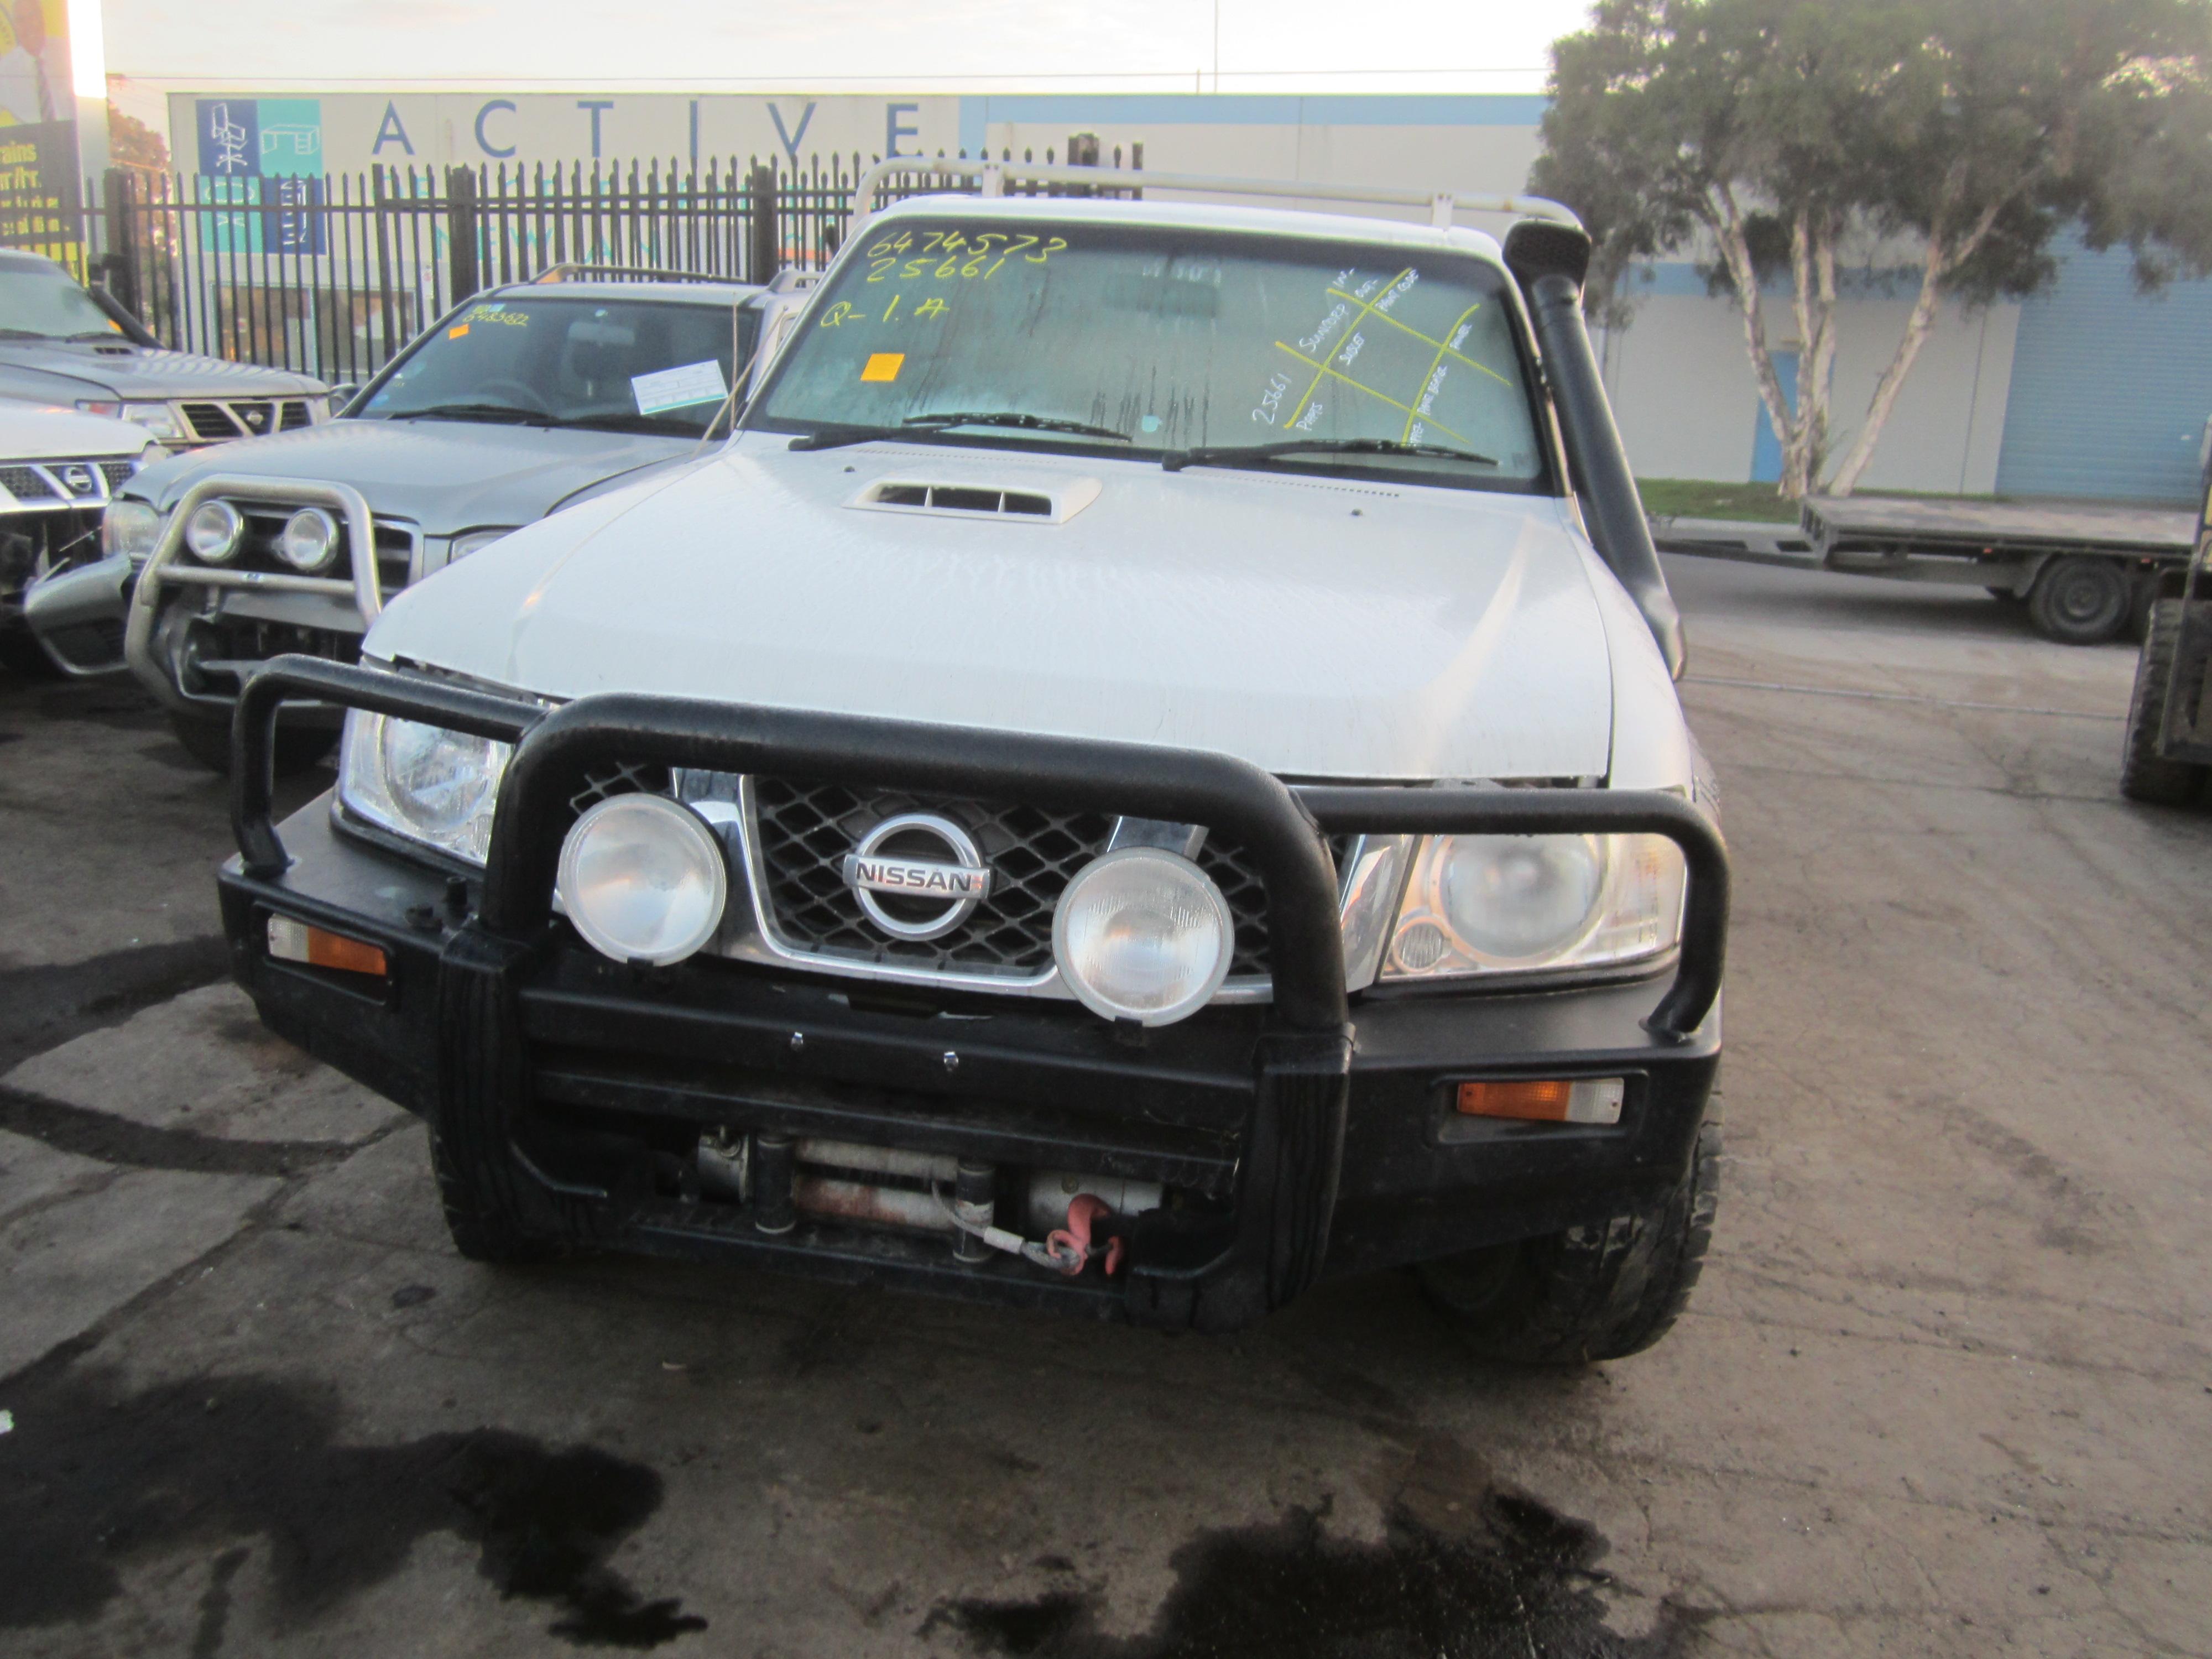 Nissan Patrol Parts Online | Buy Nissan Patrol Spare Parts Online